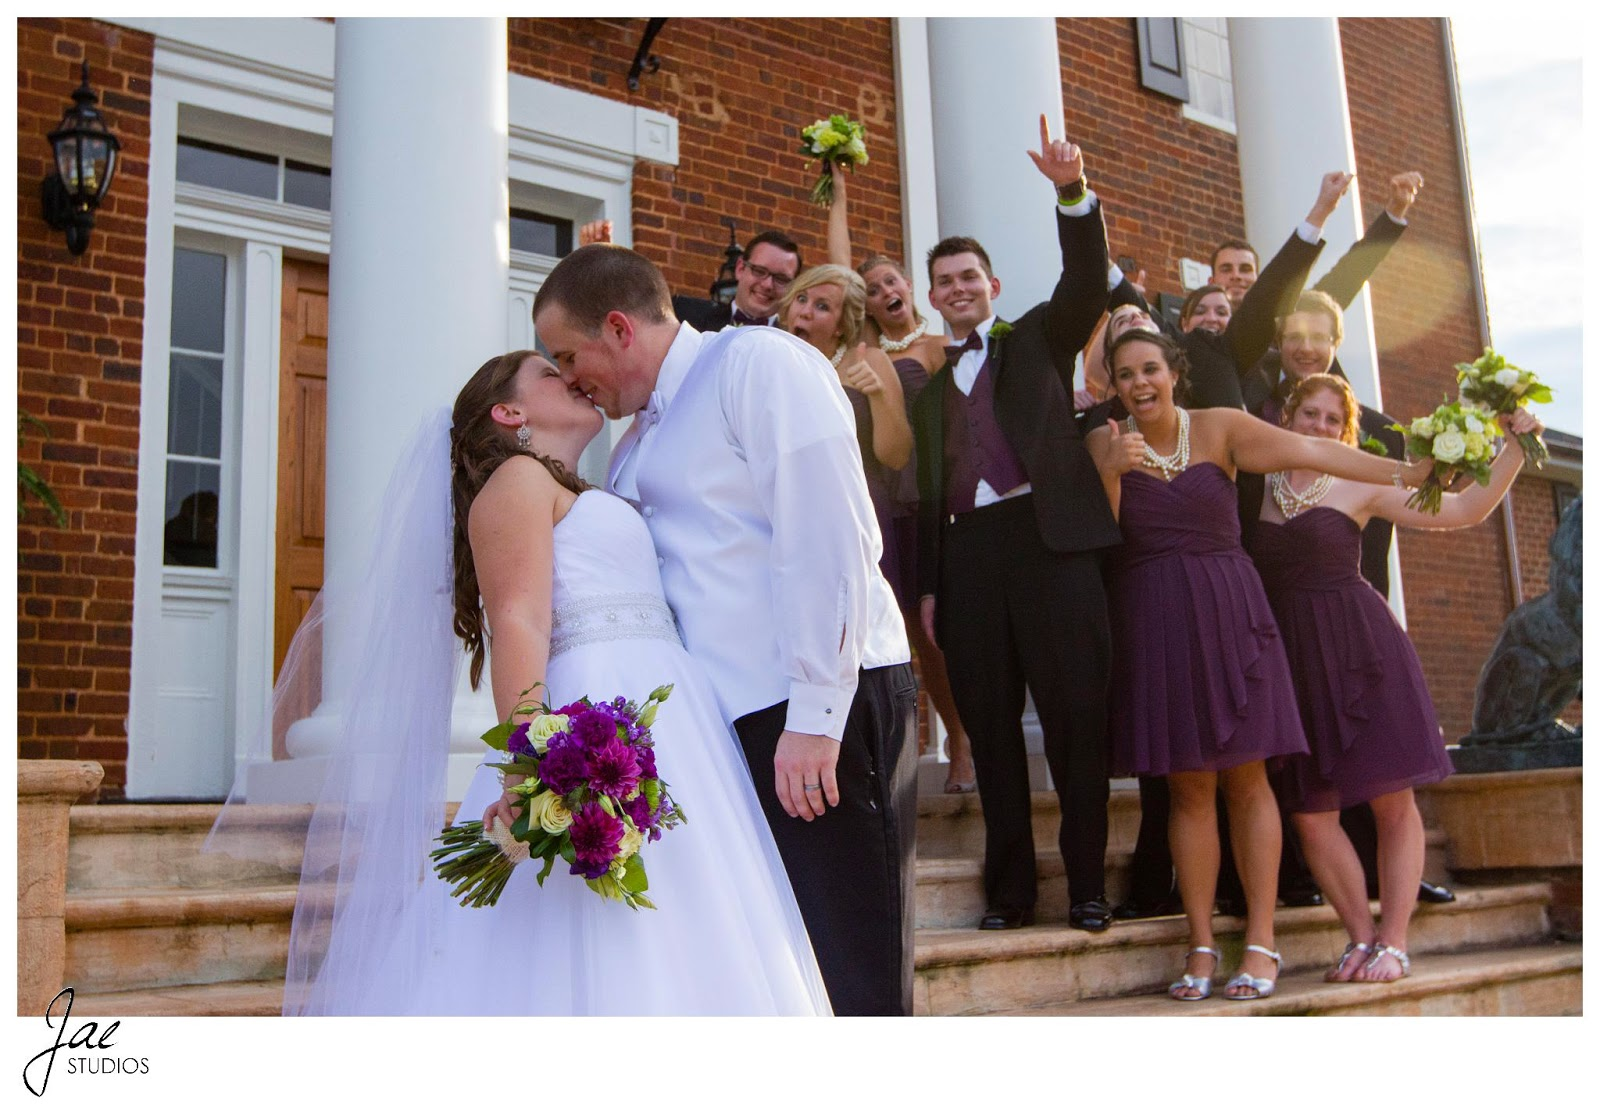 Jonathan and Julie, Bird cage, West Manor Estate, Wedding, Lynchburg, Virginia, Jae Studios, bridesmaids, groomsmen, flowers, purple, kissing, wedding dress, tuxedo, veil, funny